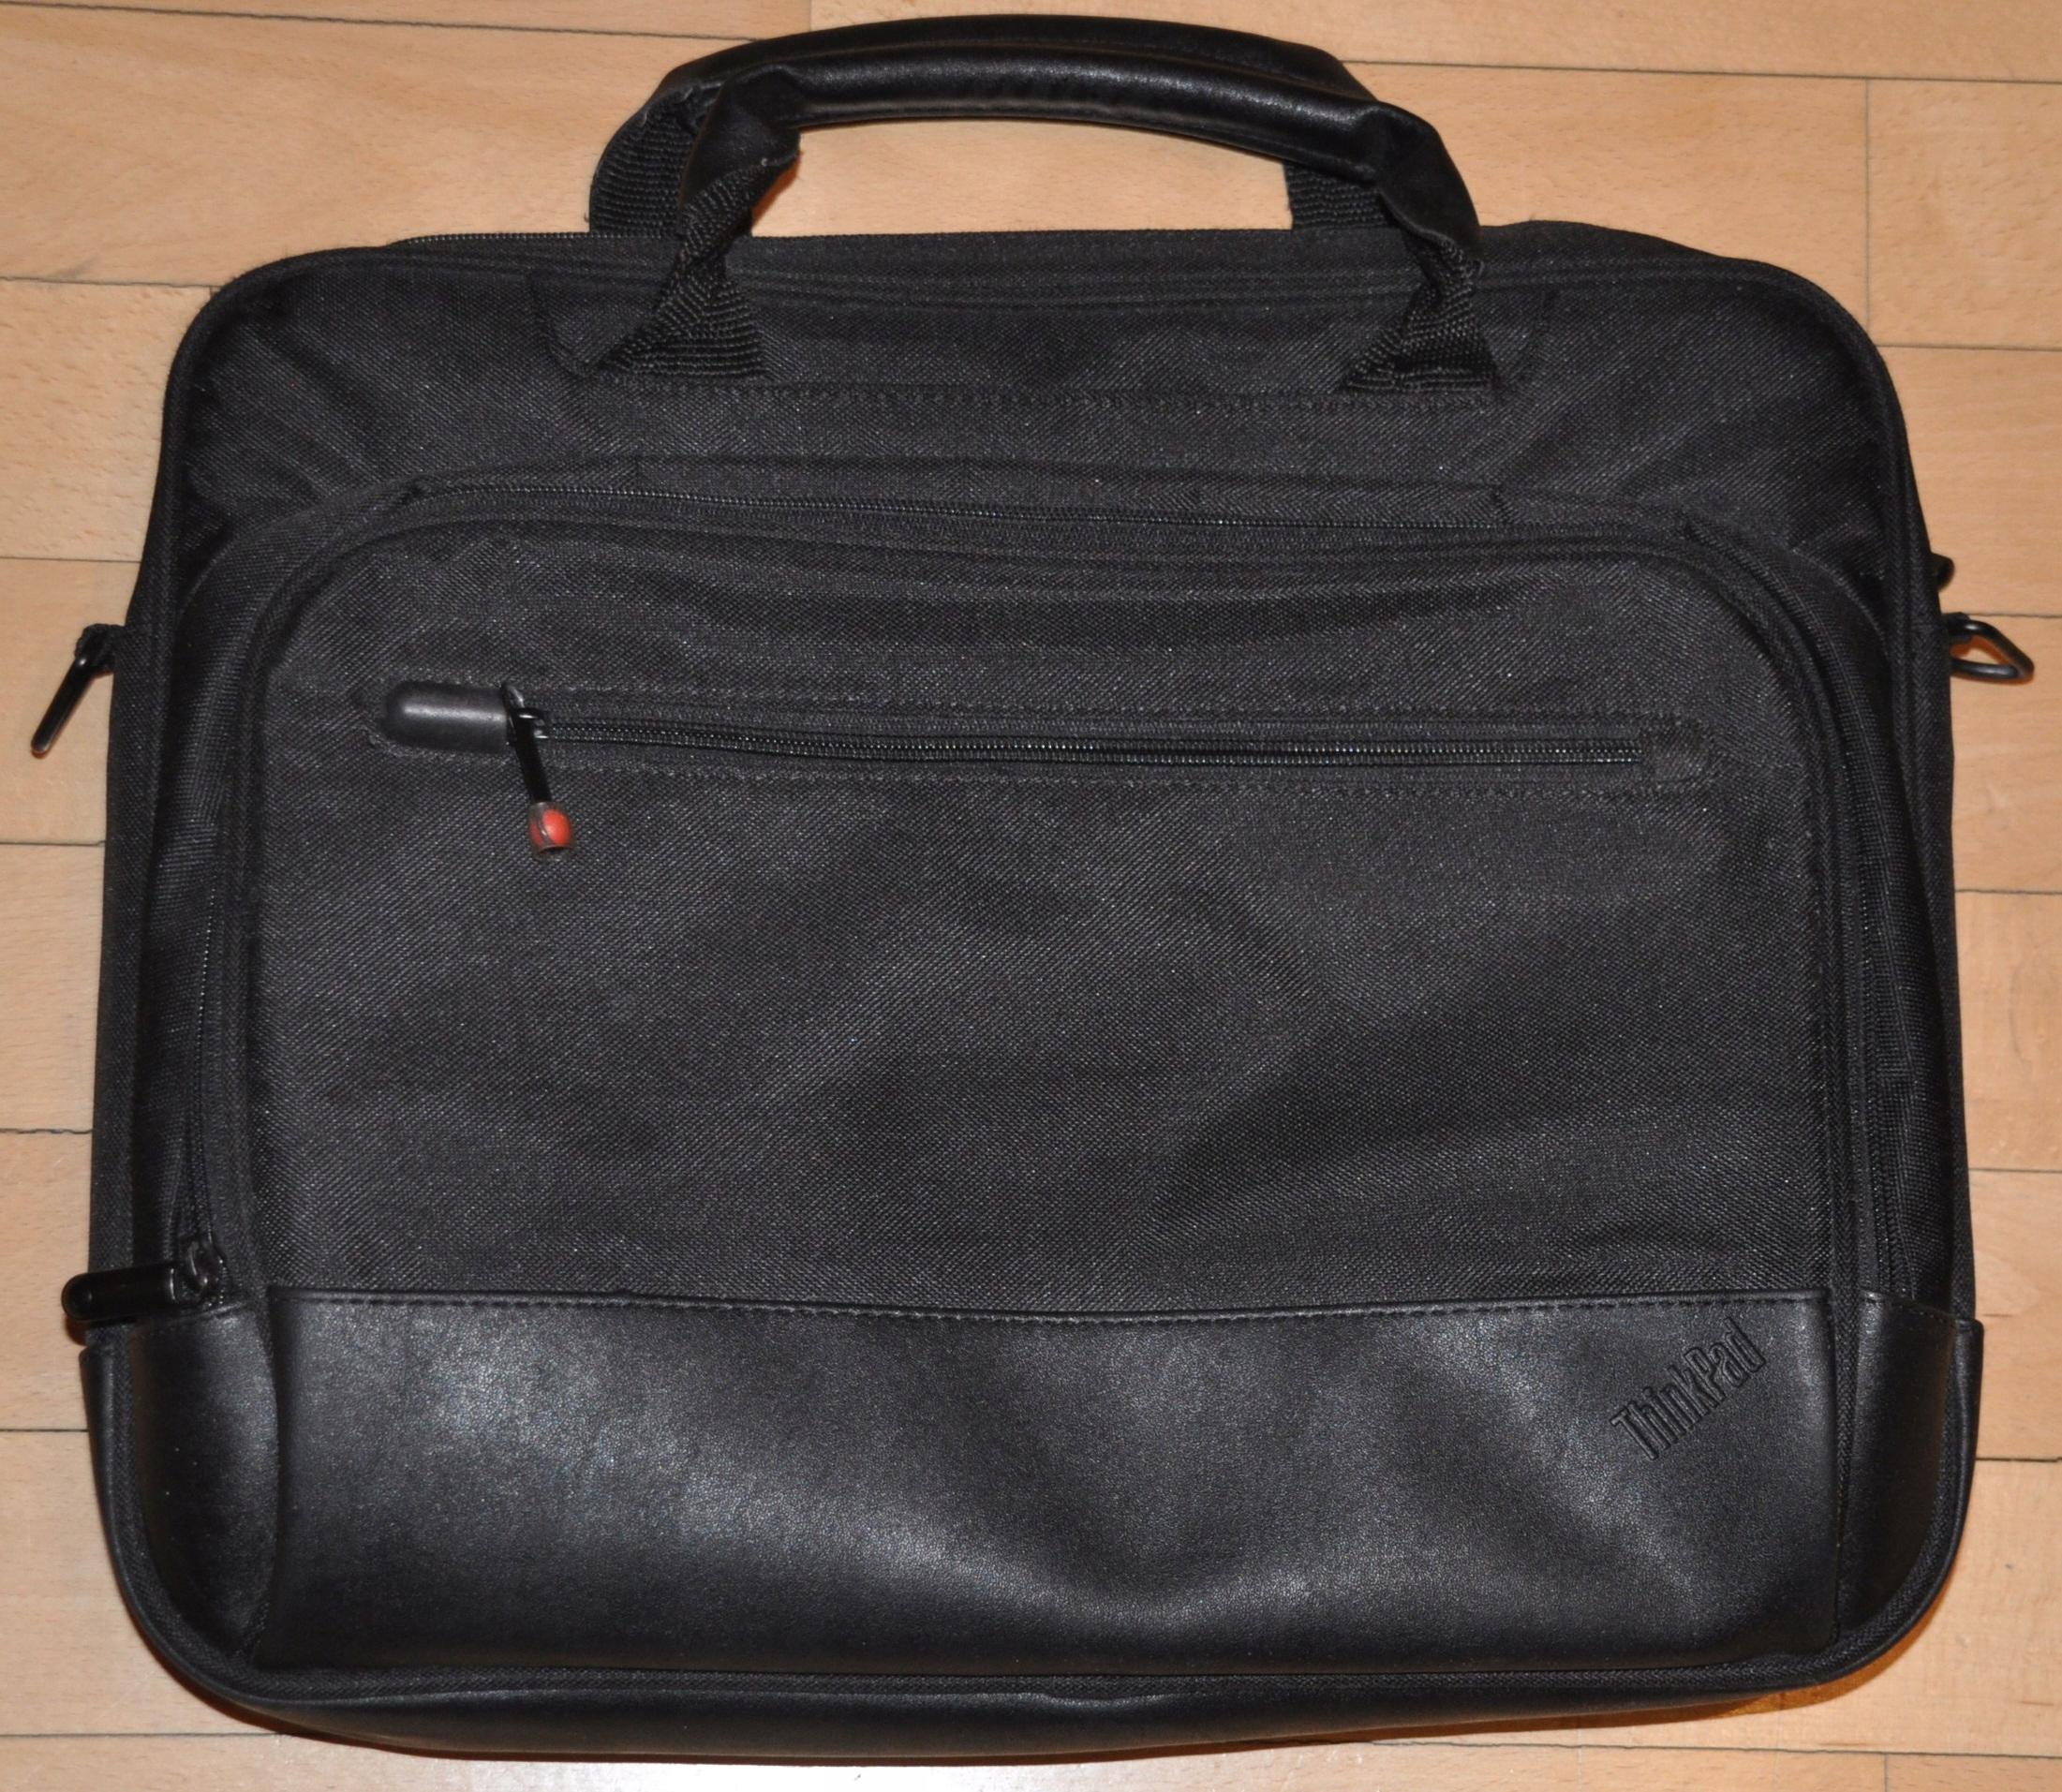 947578f052816 torba do laptopa Think Pad - 7716539445 - oficjalne archiwum allegro